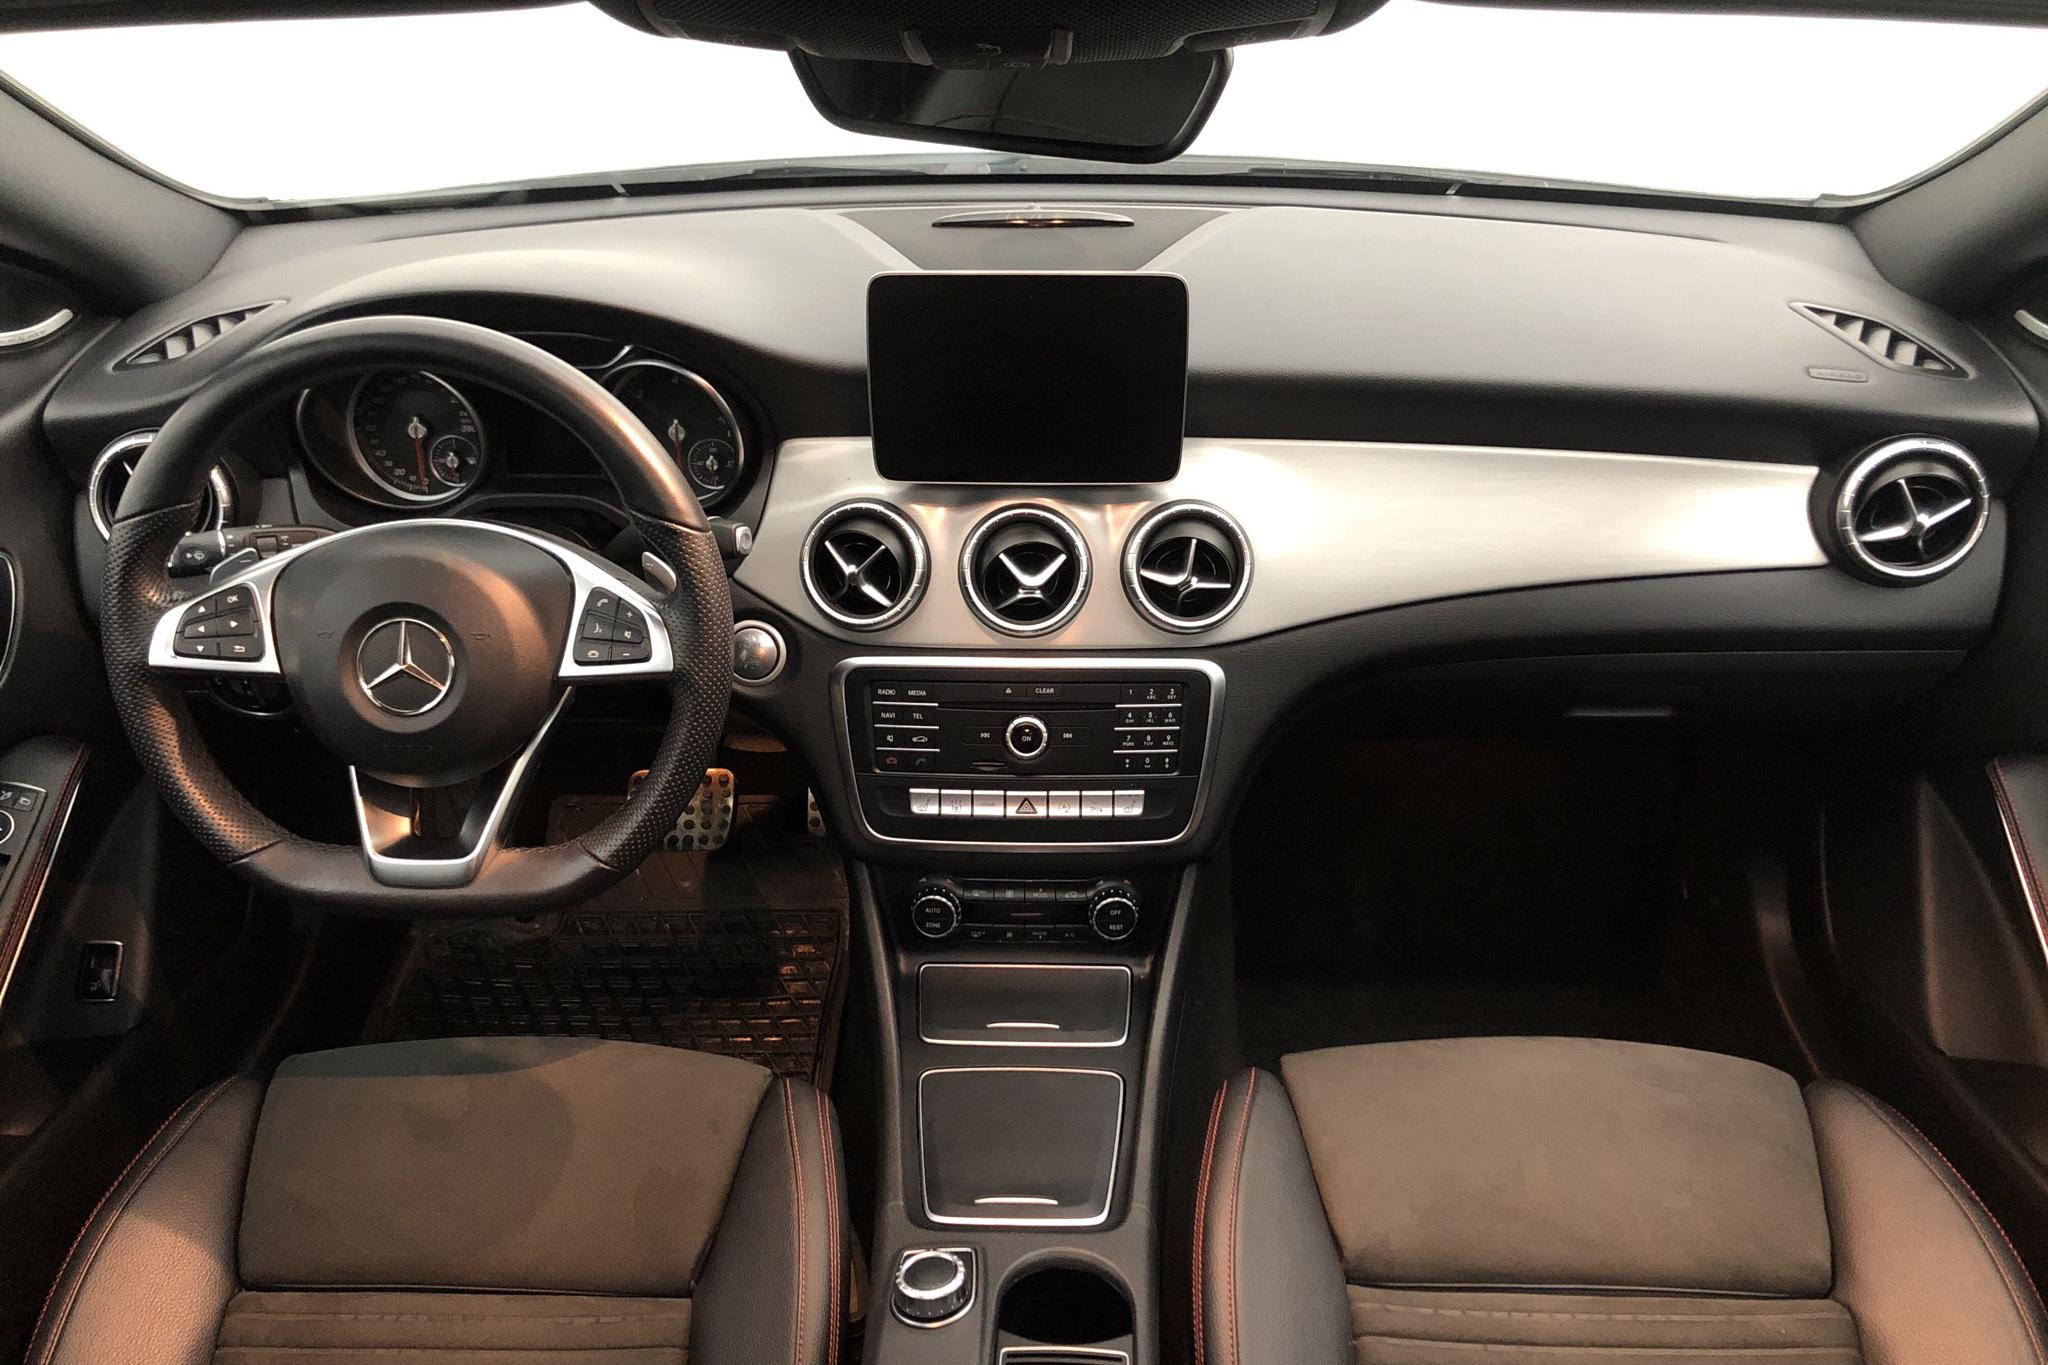 Mercedes CLA 220 d Shooting Brake X117 (170hk) - 3 605 mil - Automat - vit - 2019